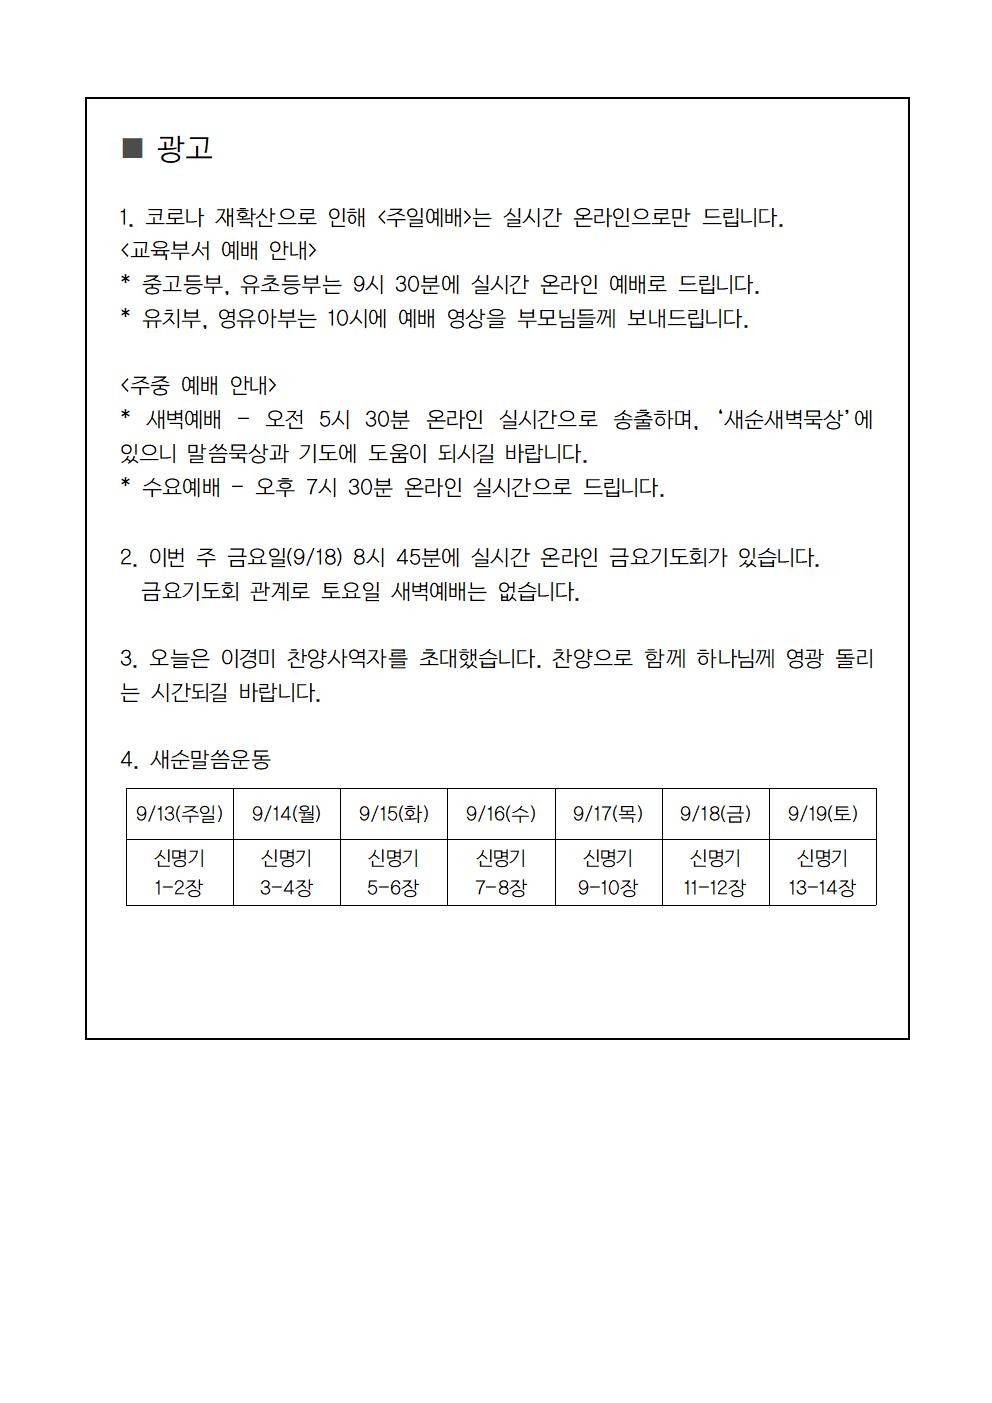 KakaoTalk_Photo_2020-09-20-09-21-01-1.jpeg